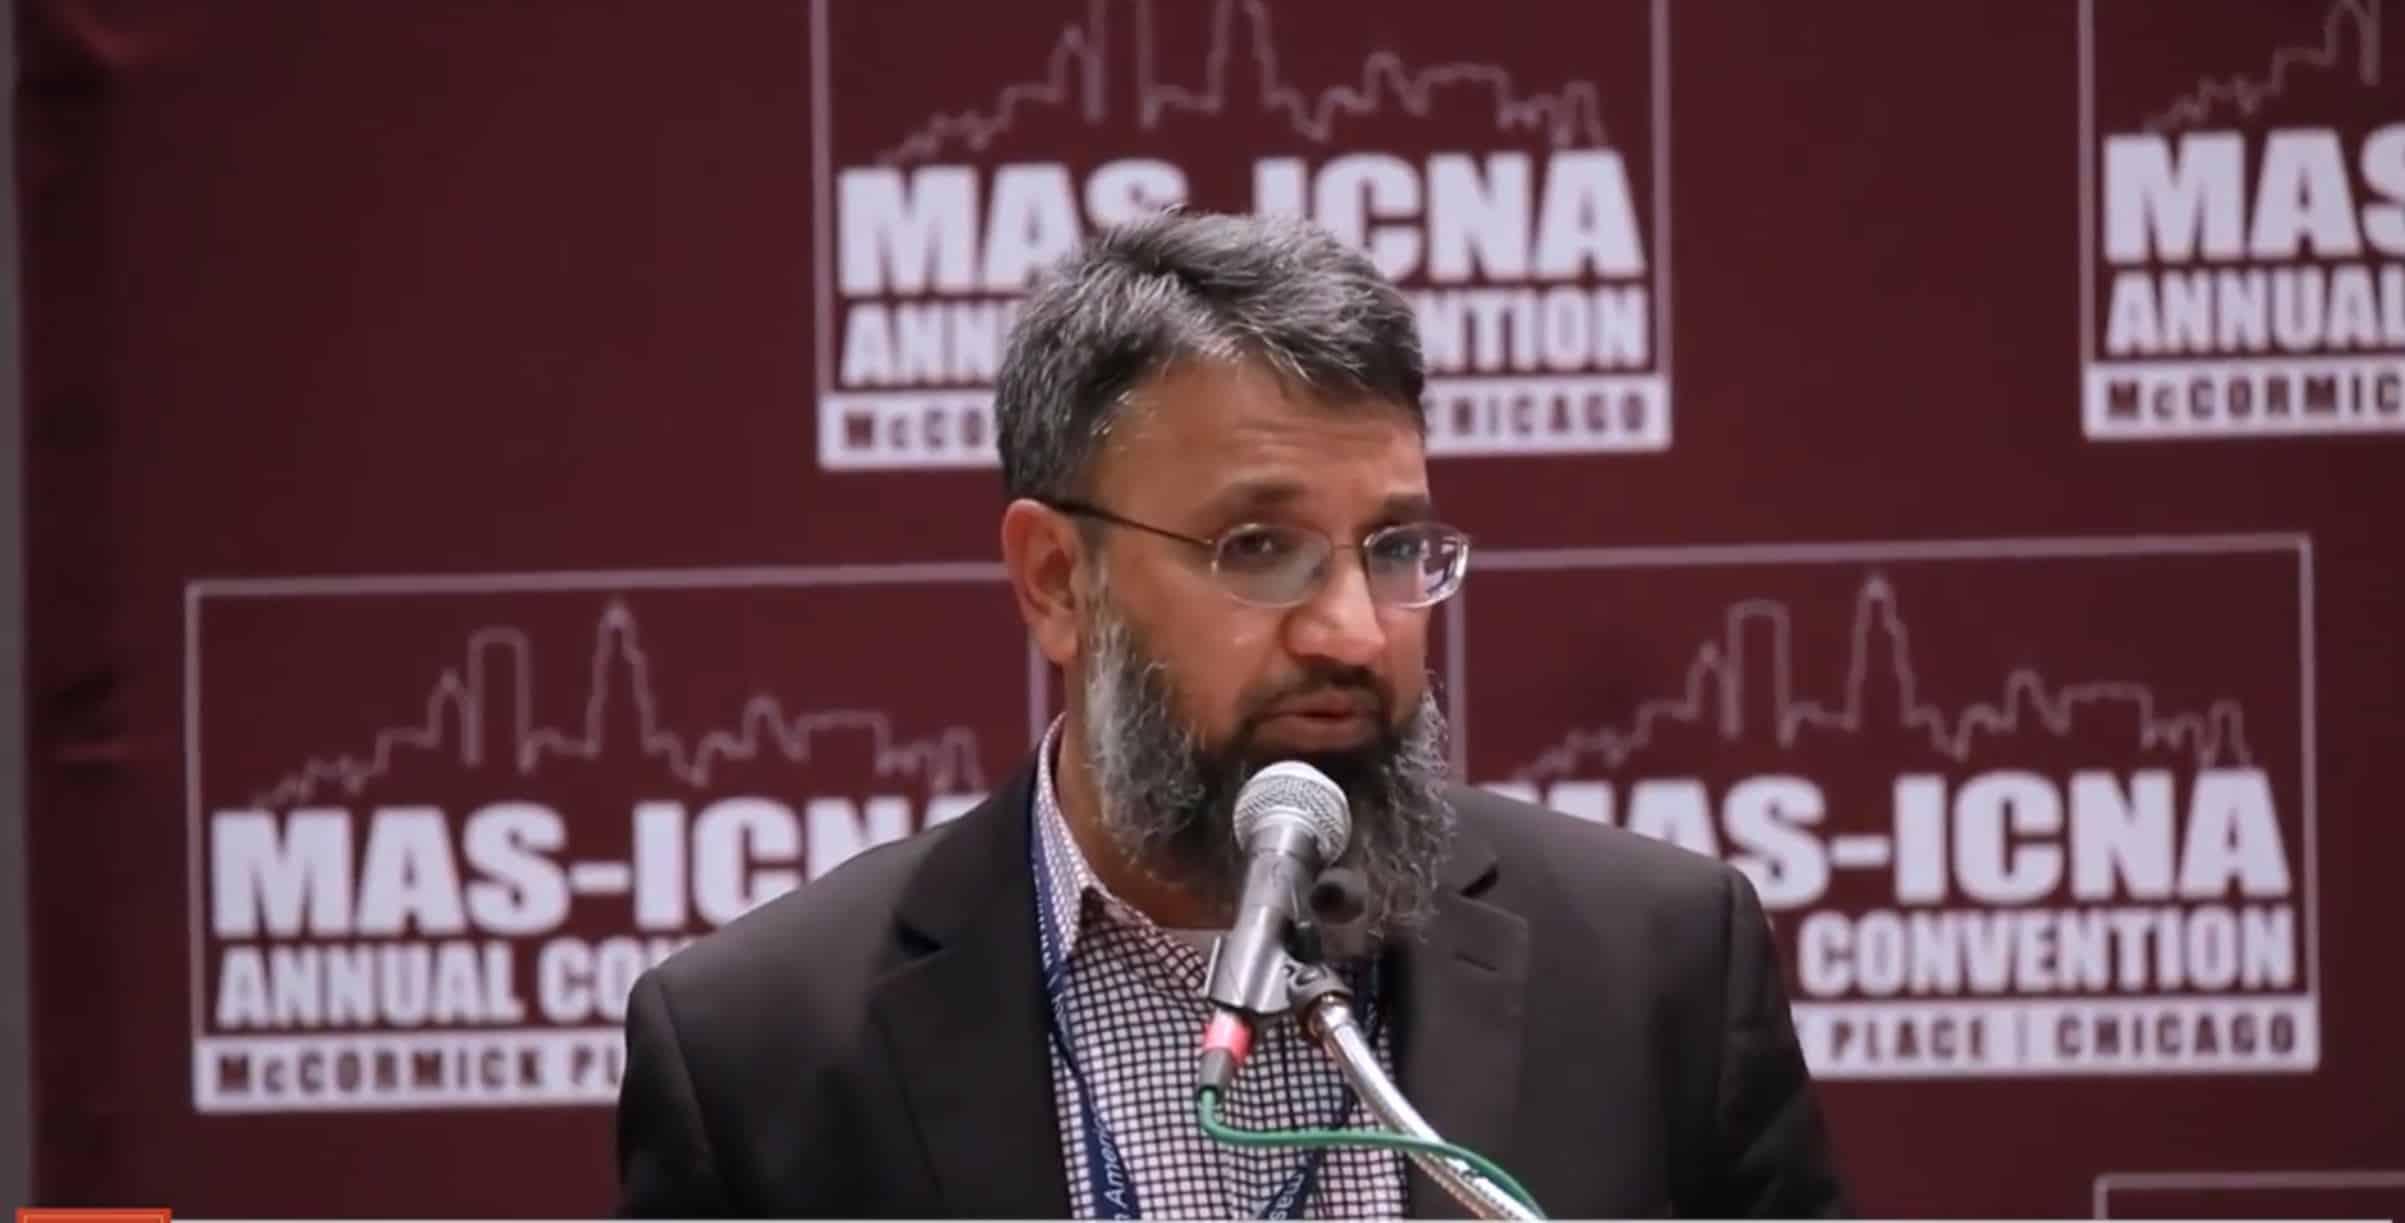 Altaf Husain – Black Muslim Americans and the Challenge of Community Integration